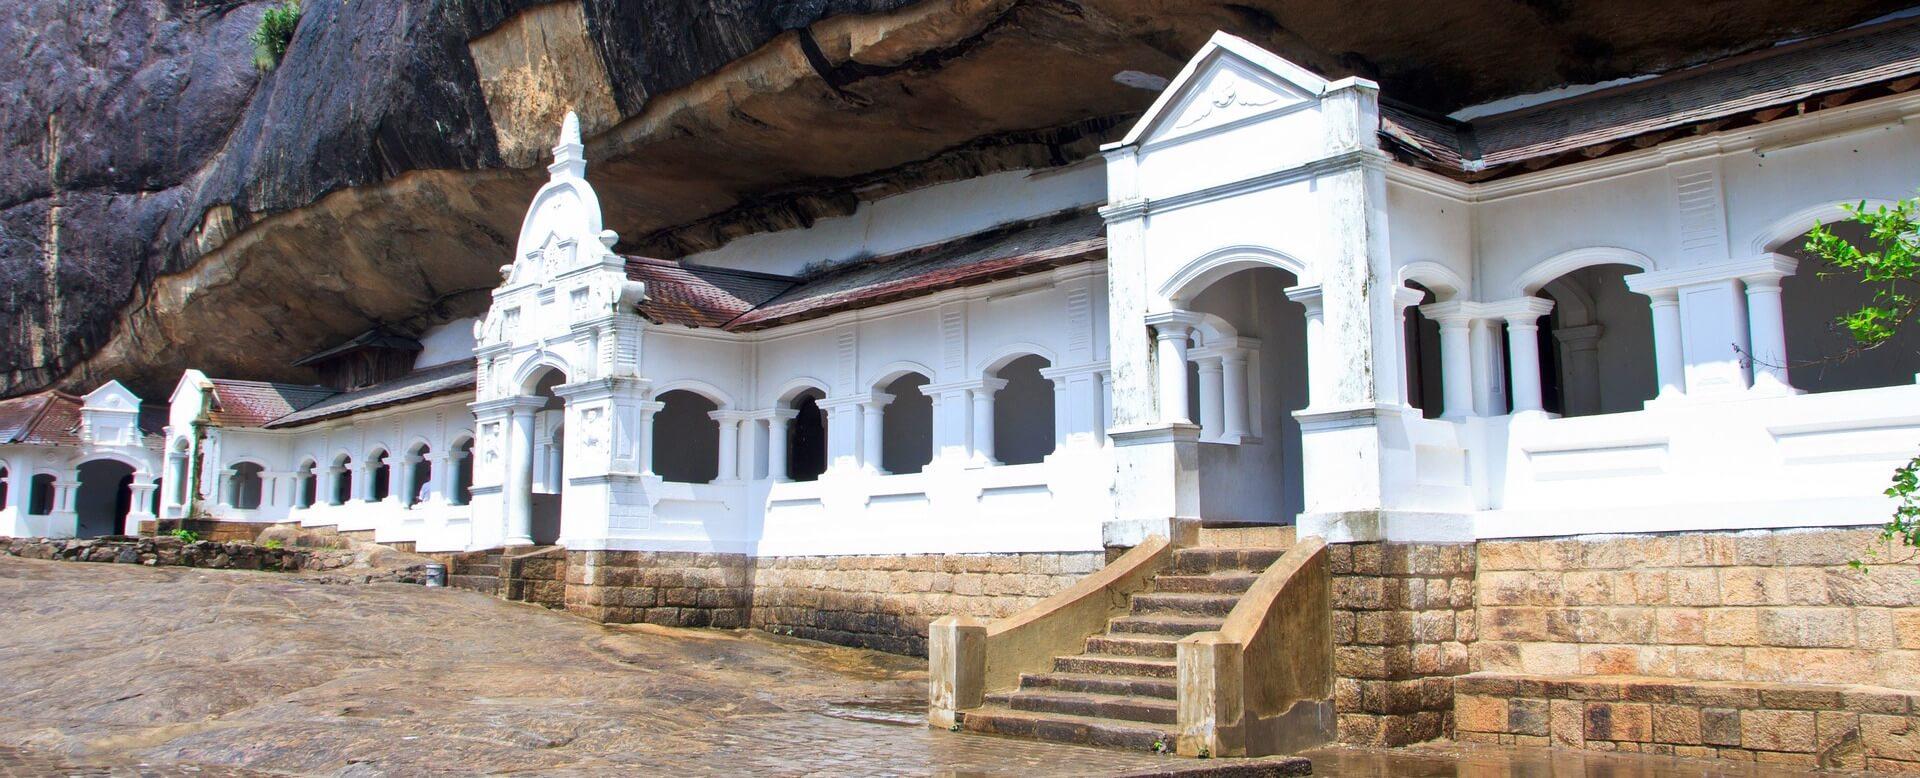 Les grottes de Dambulla - Sri Lanka